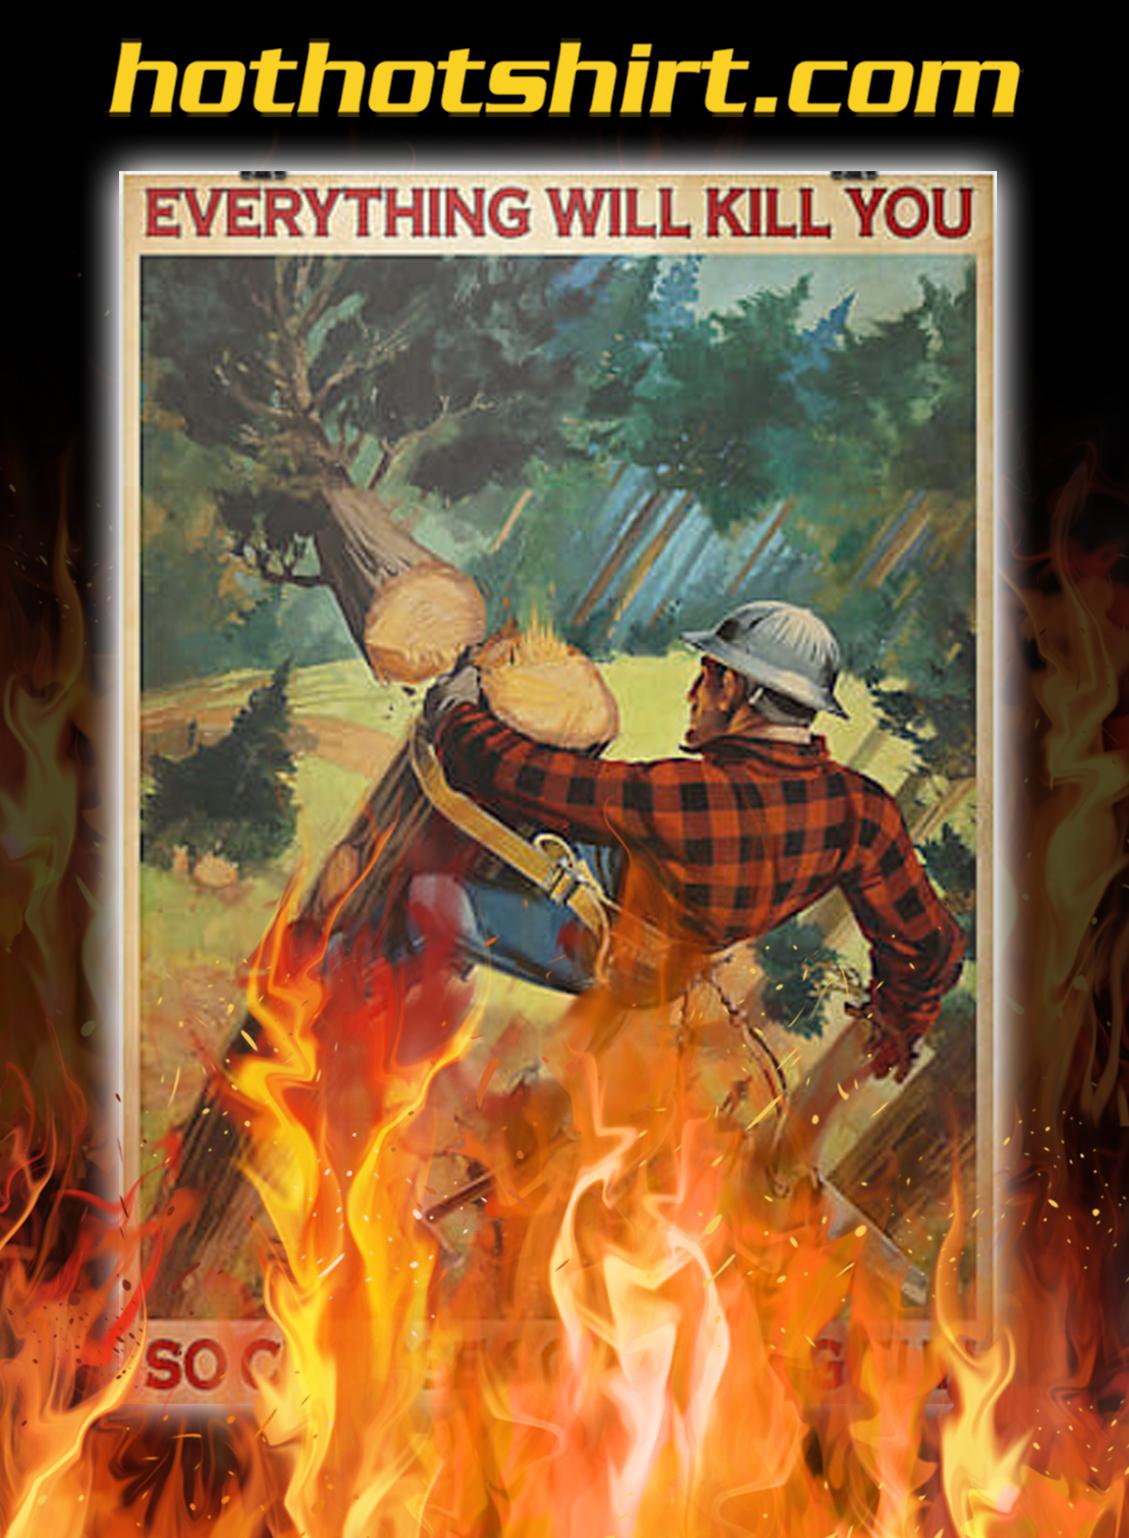 Lumberman everything will kill you so choose something fun poster - A3